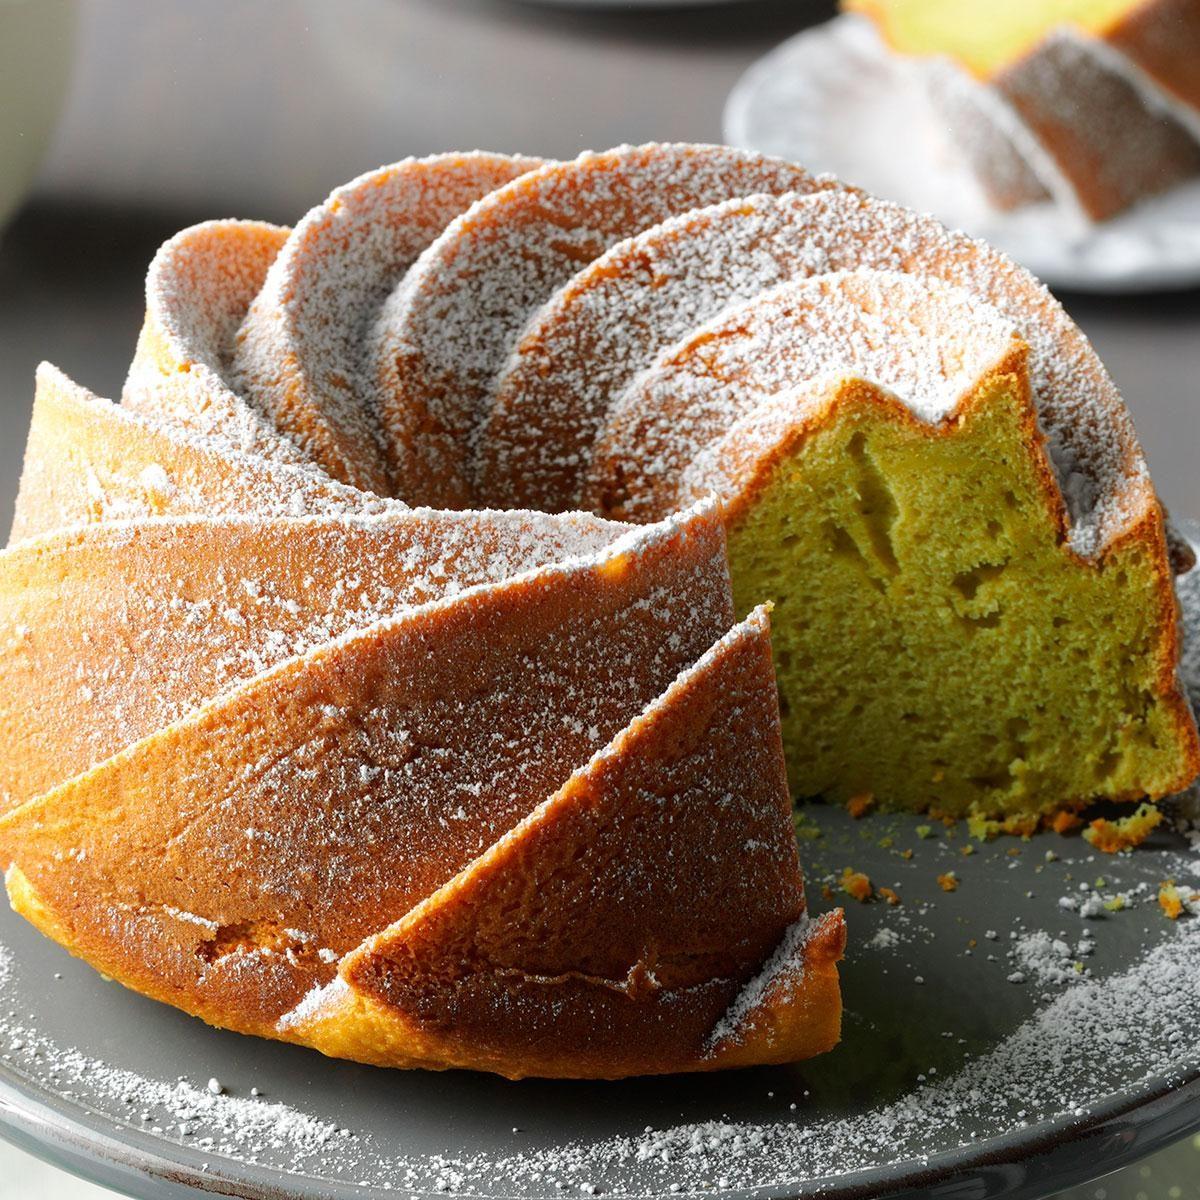 Pistachio tube cake